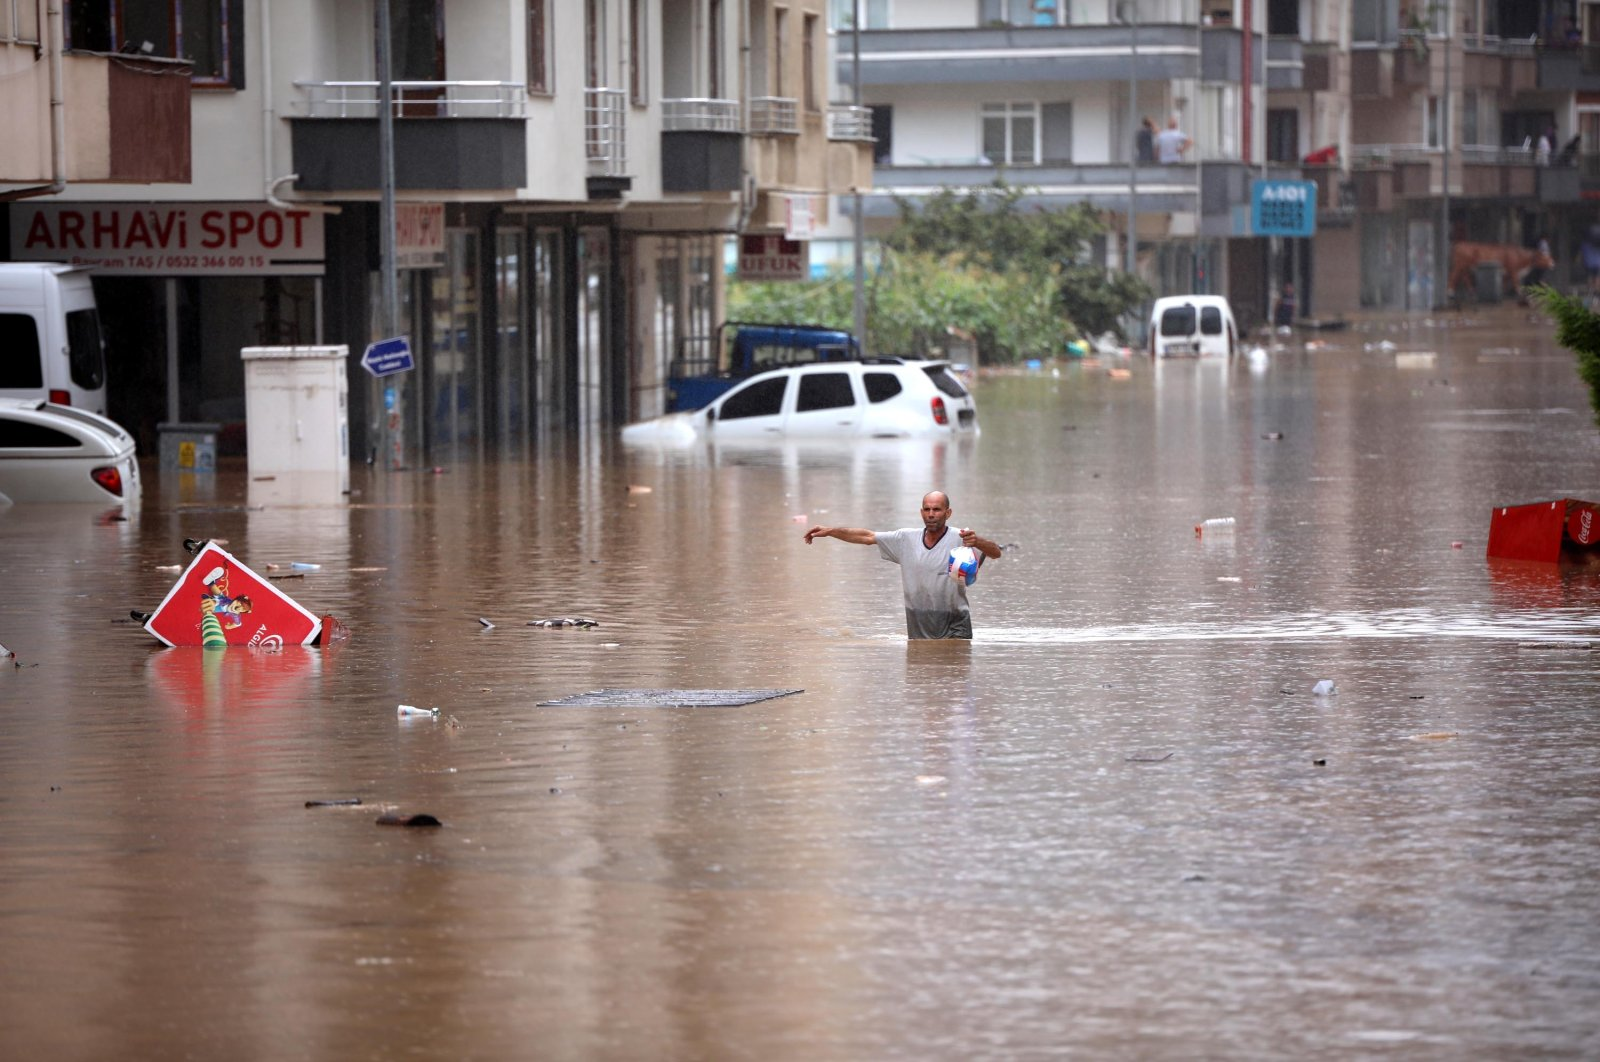 A man wades through a flooded street, in Arhavi district, in Artvin, northeastern Turkey, July 22, 2021. (DHA PHOTO)